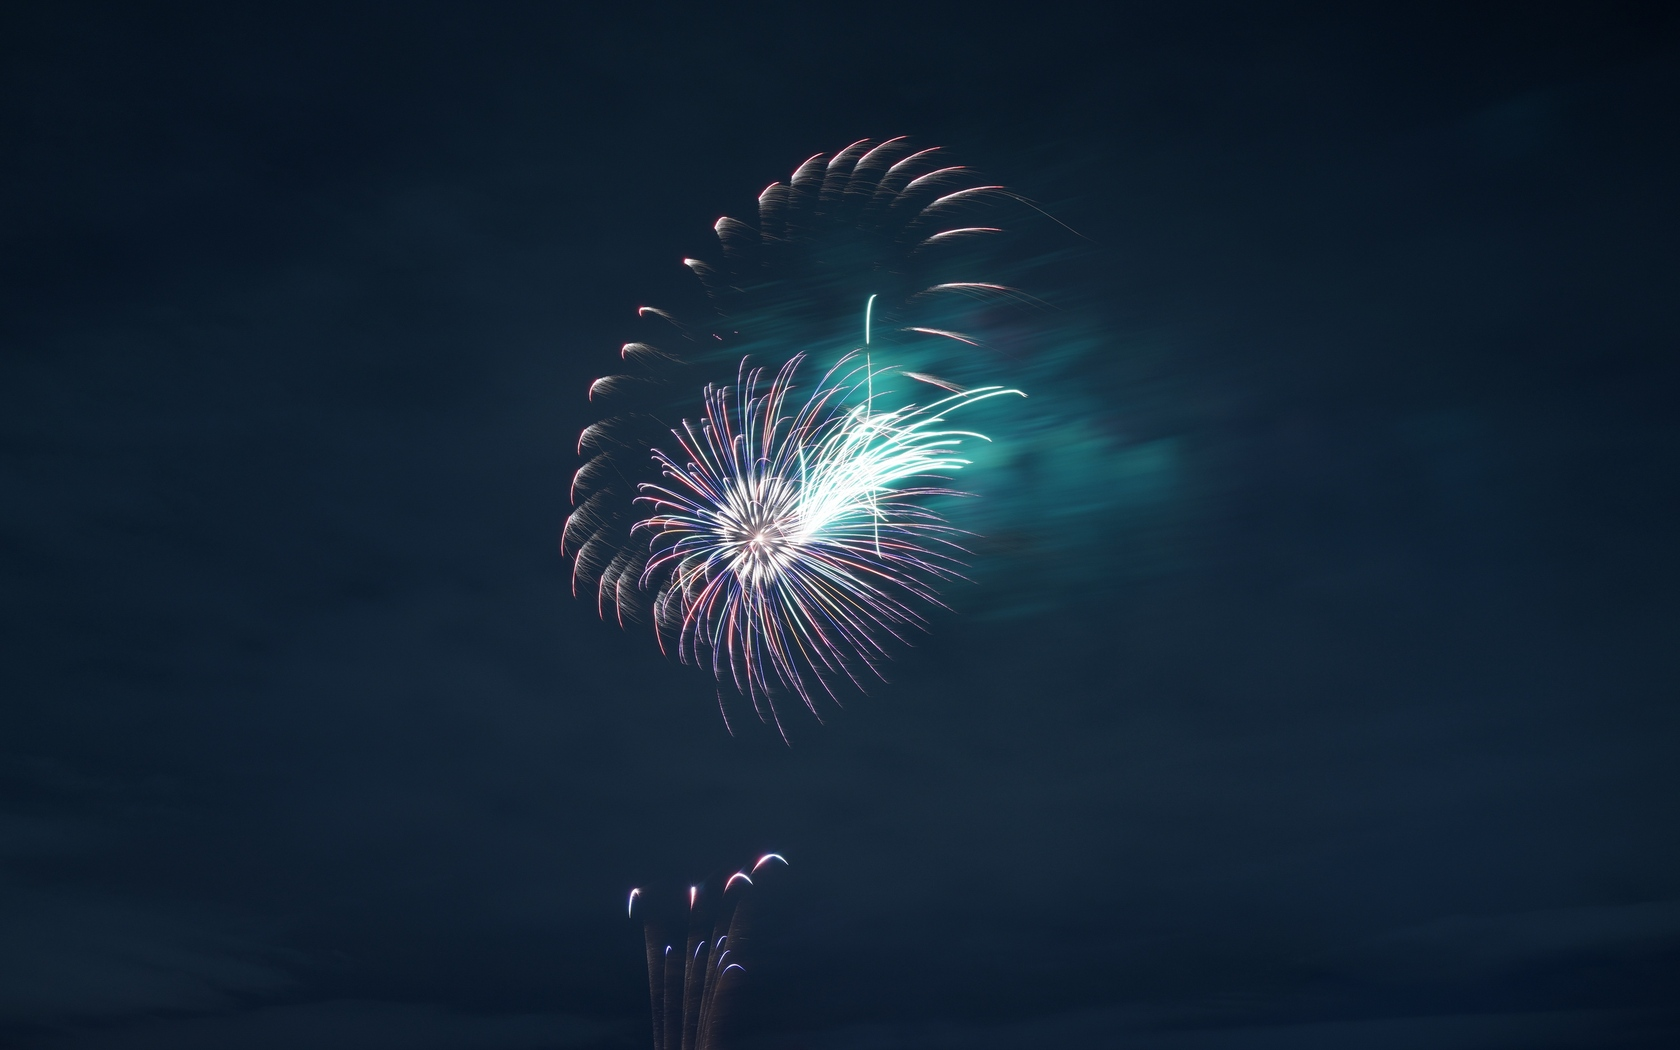 fireworks-night-4k-vg.jpg